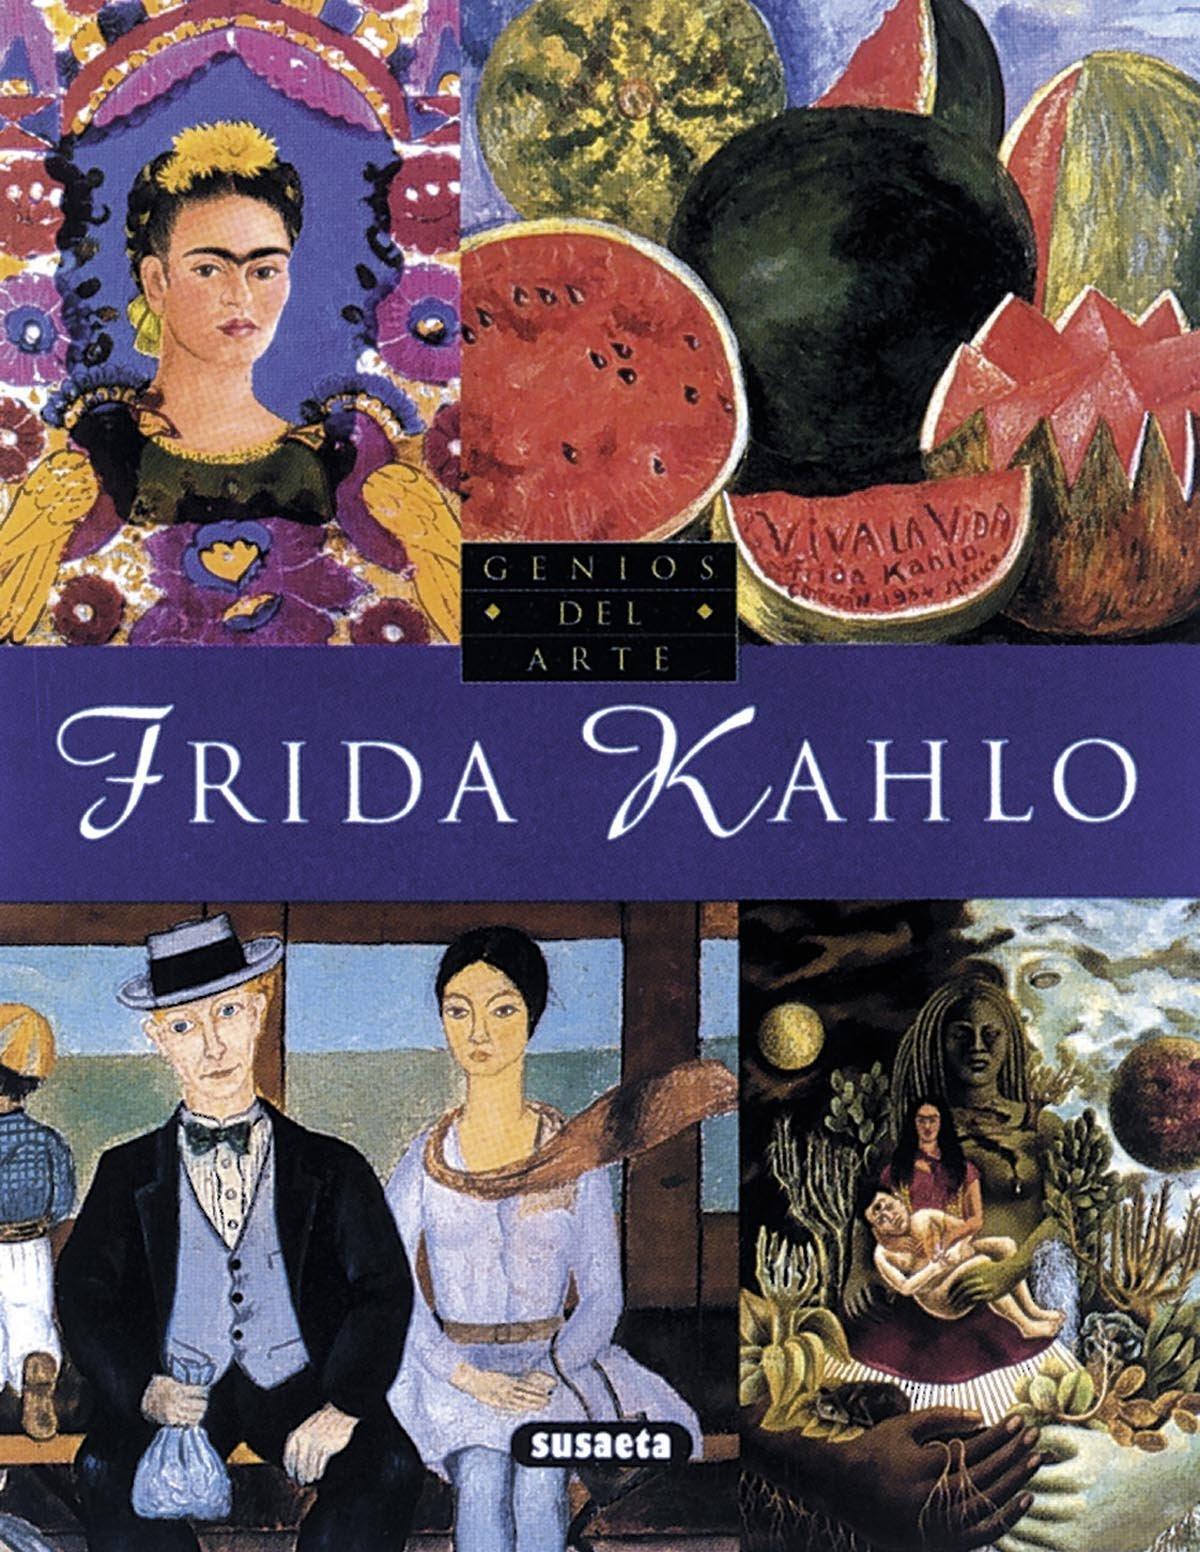 frida khalo edicion espanol spanish edition